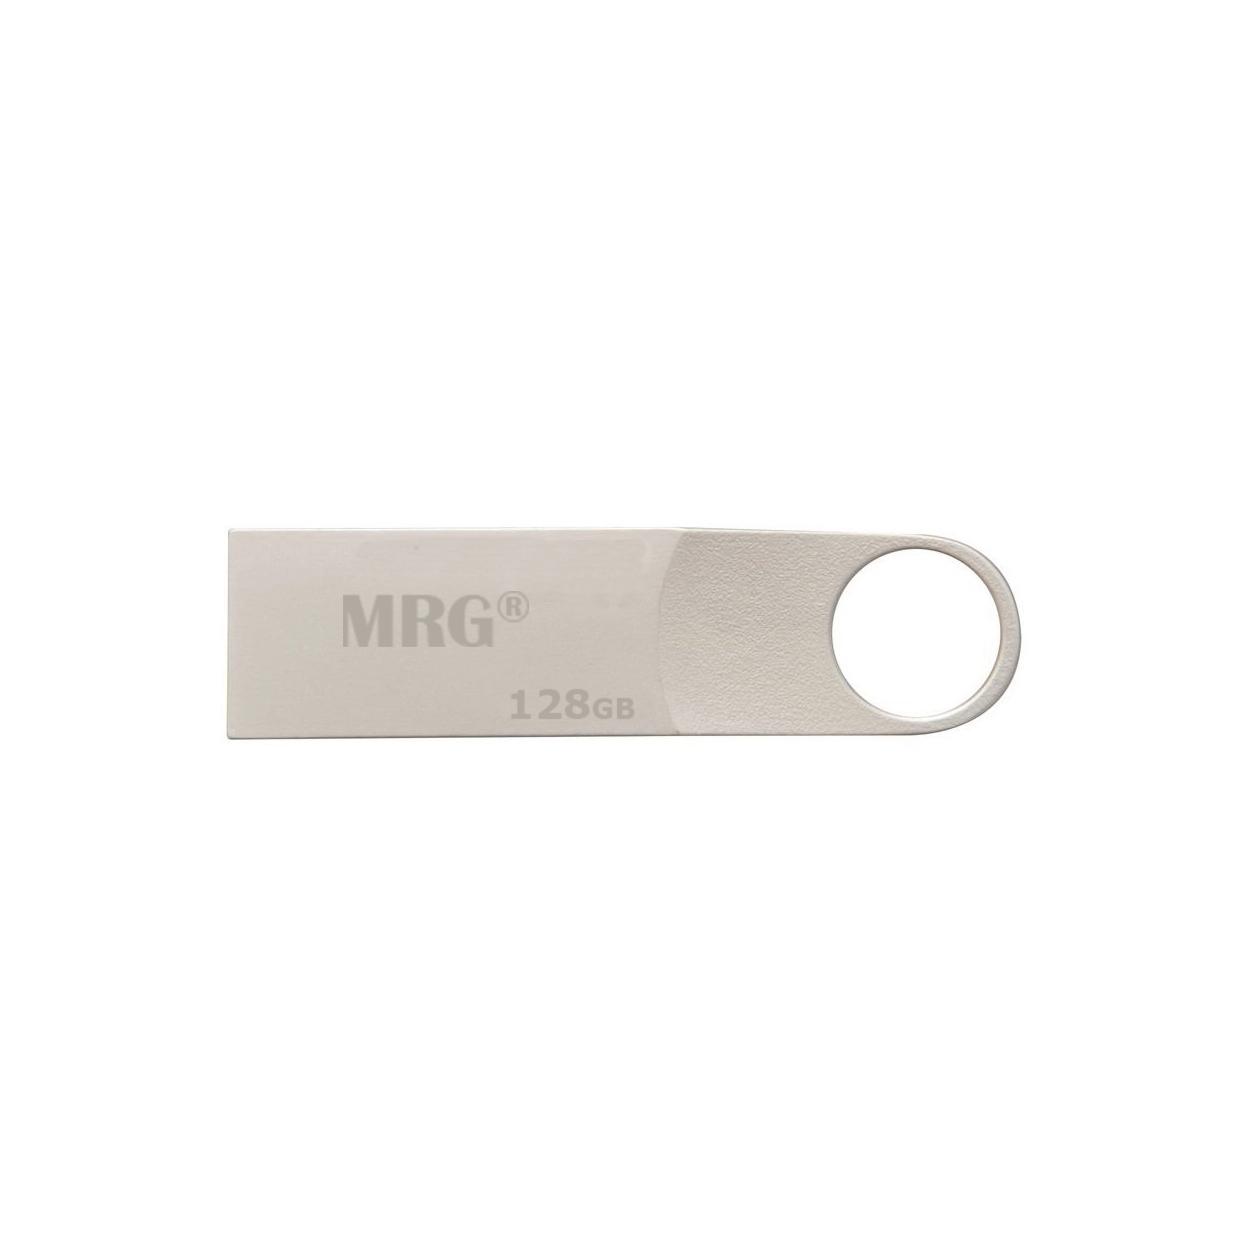 Memorie USB MRG M-SE9, USB 2.0, 128 GB, Gri